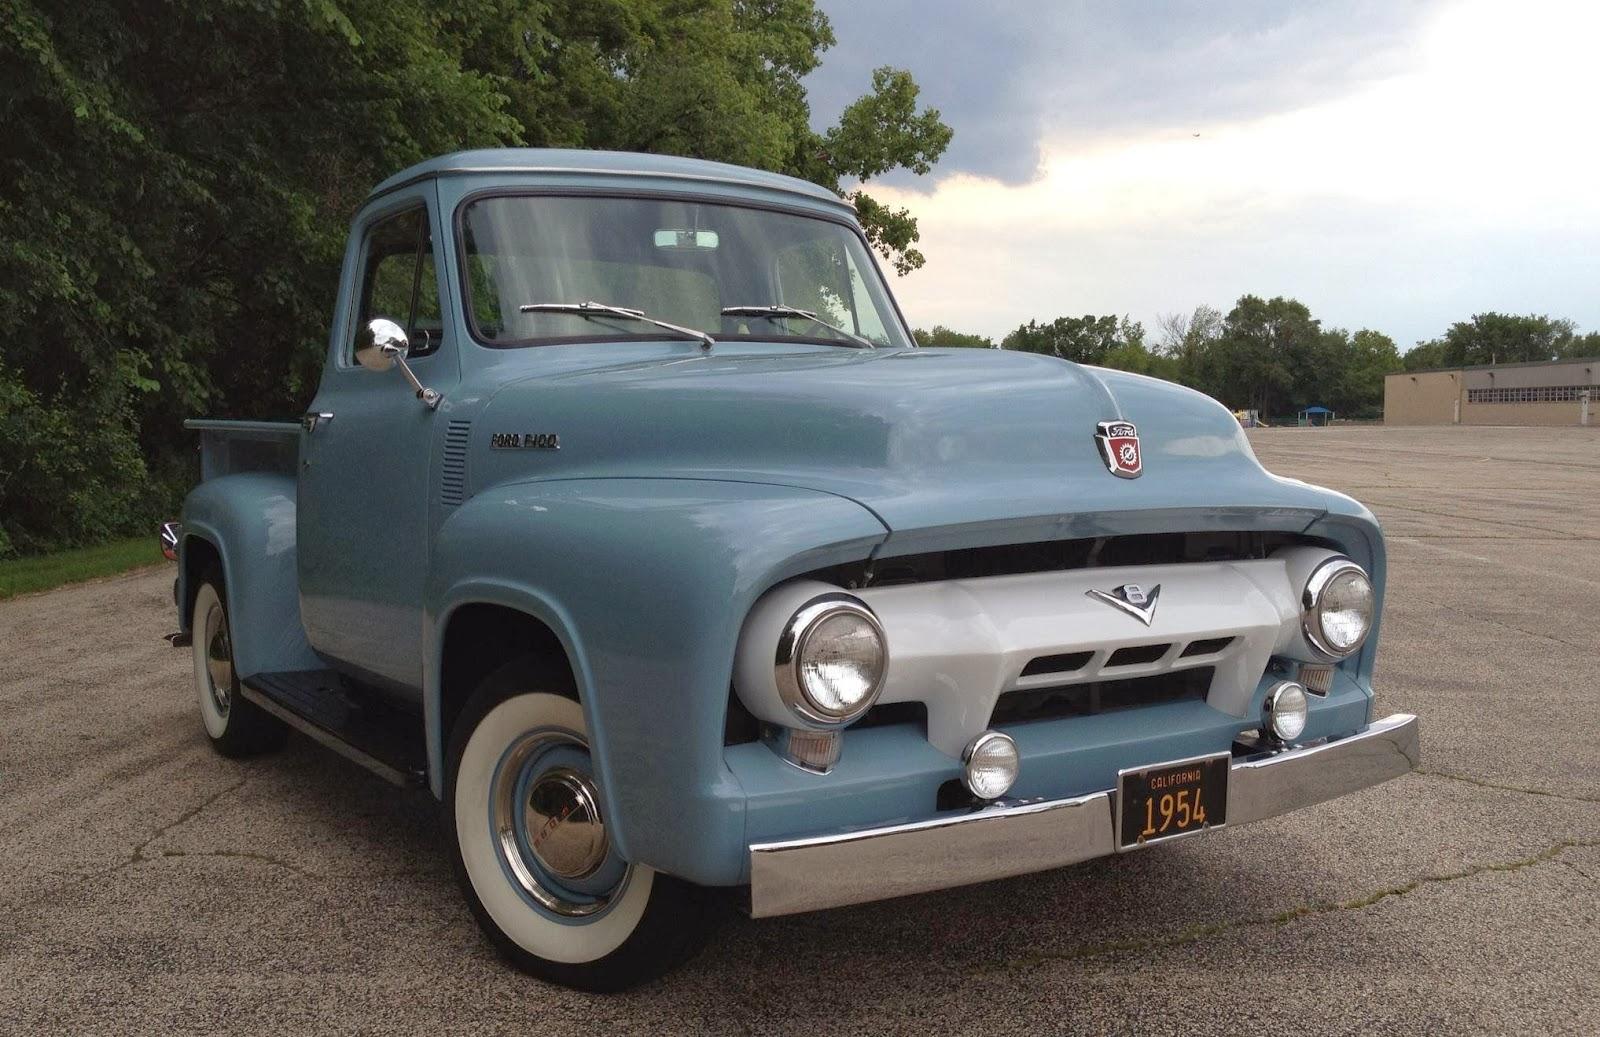 Dinnerhill Speedshop Original Color Codes 1955 Ford F100 Pickup Truck Code M0184 Courtesy Fernando P Martinez